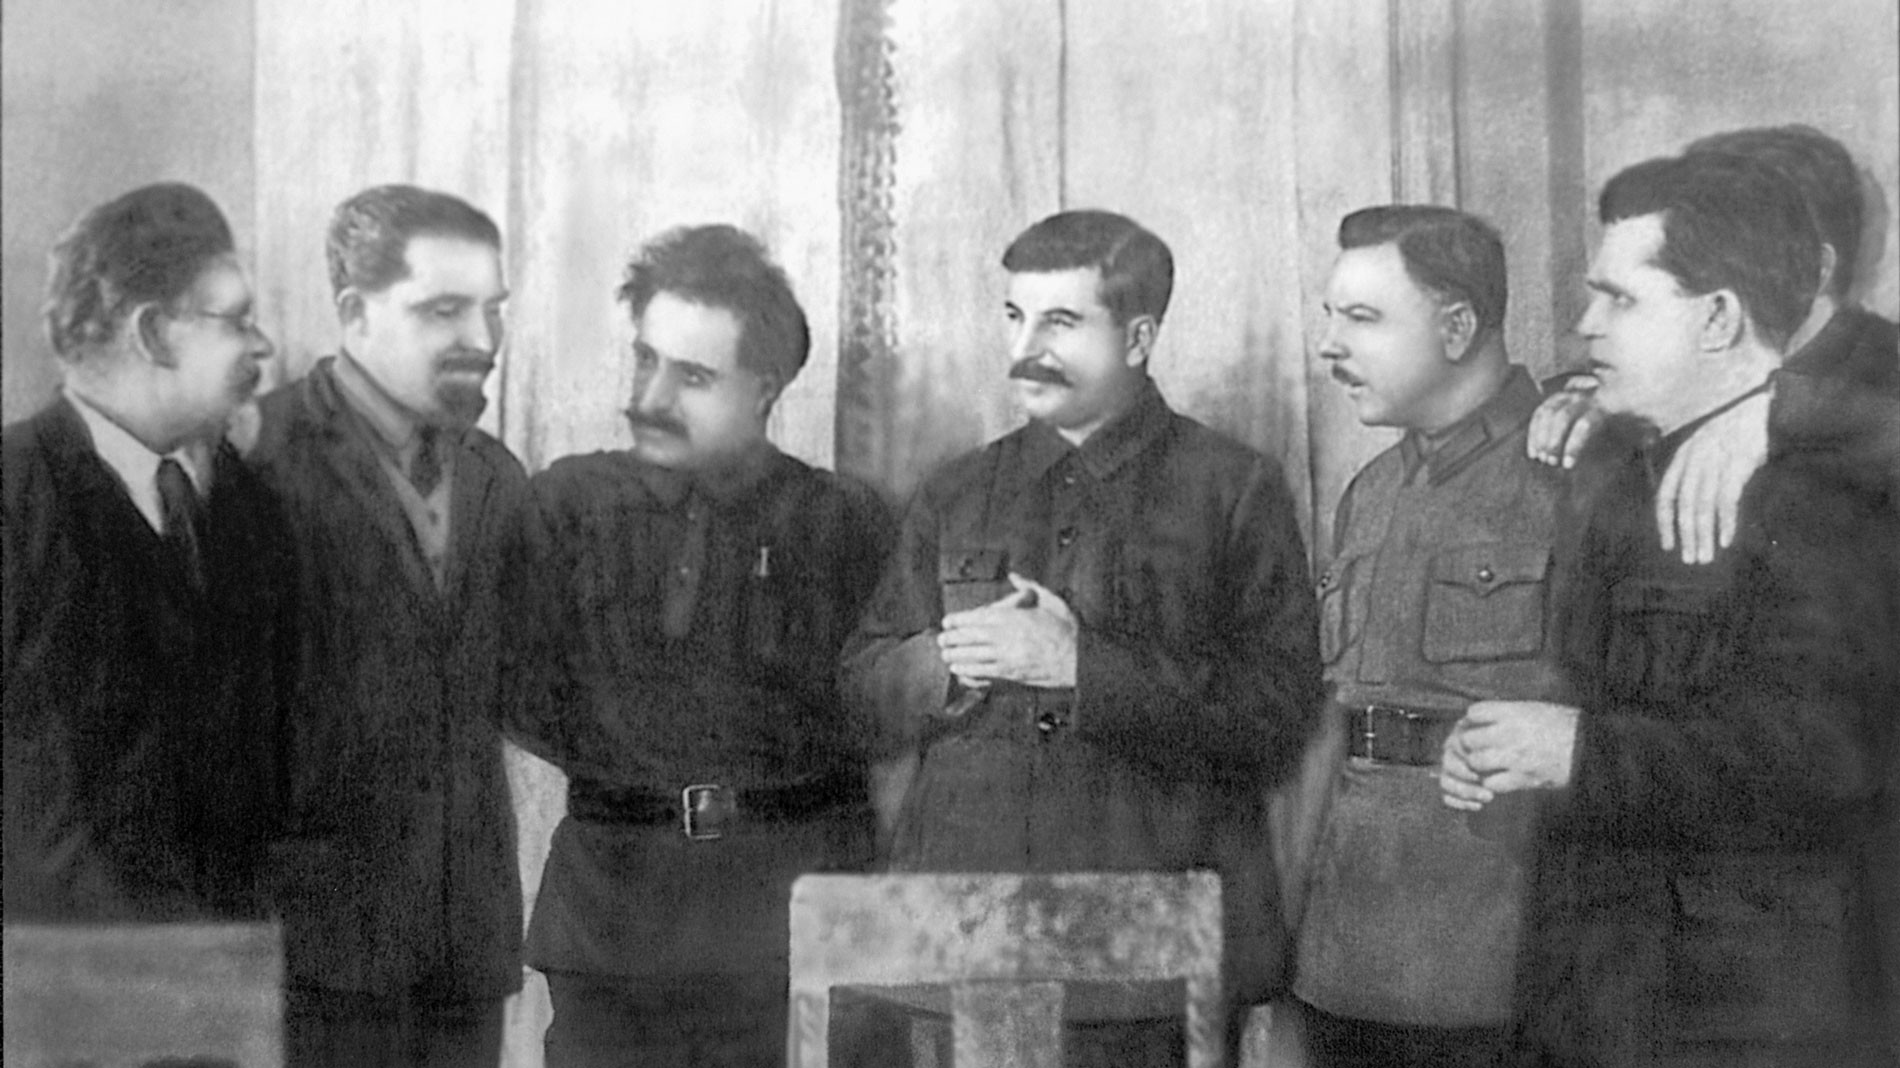 На 50-летии Иосифа Сталина, 21 декабря 1929 года. Г. К. Орджоникидзе — третий слева. Фото © Wikipedia